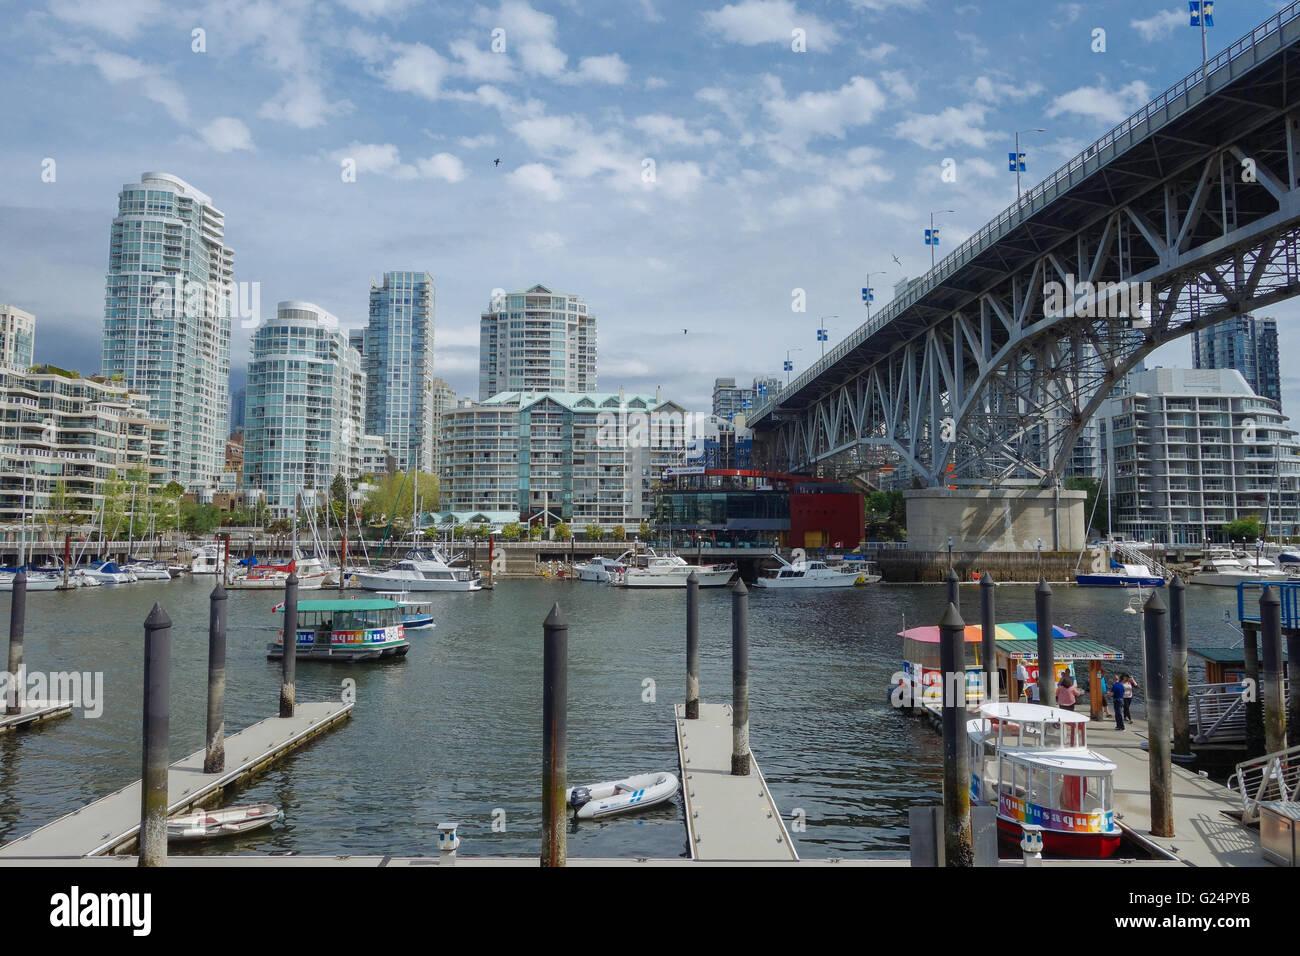 False Creek Vancouver Photo Stock